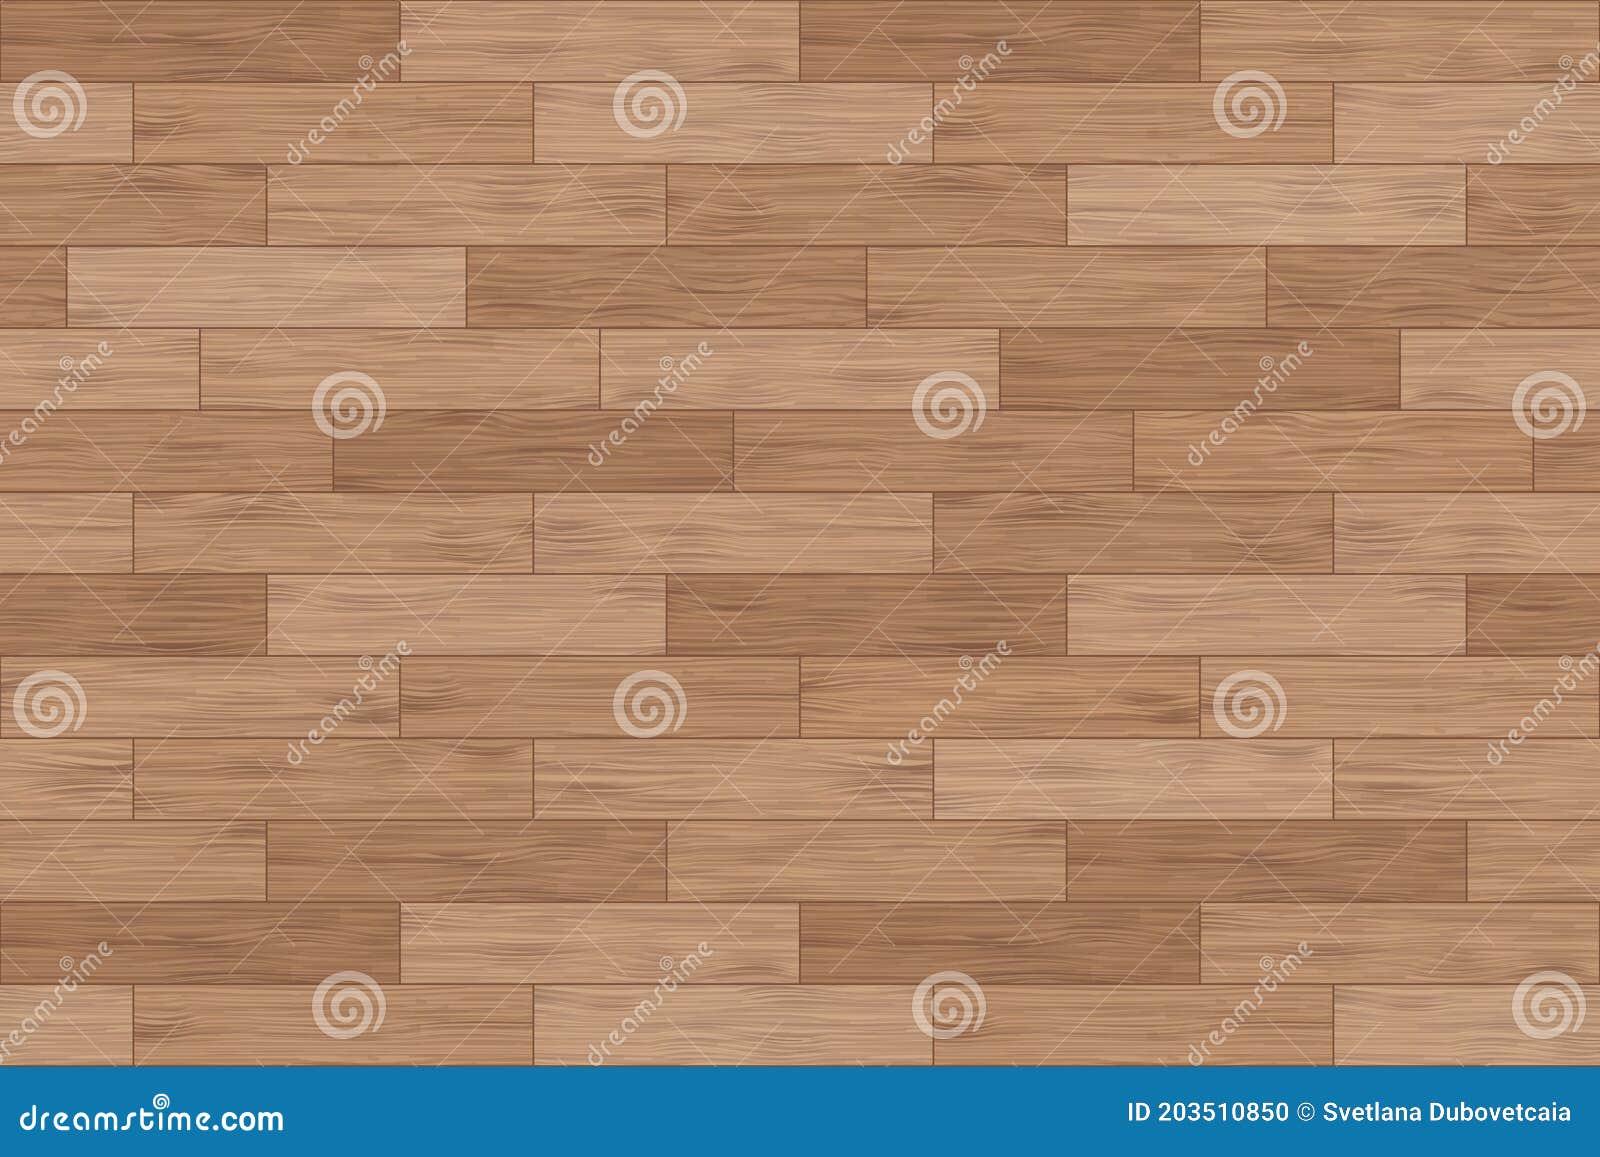 Floor Wood Parquet. Flooring Wooden Seamless Pattern. Design ...